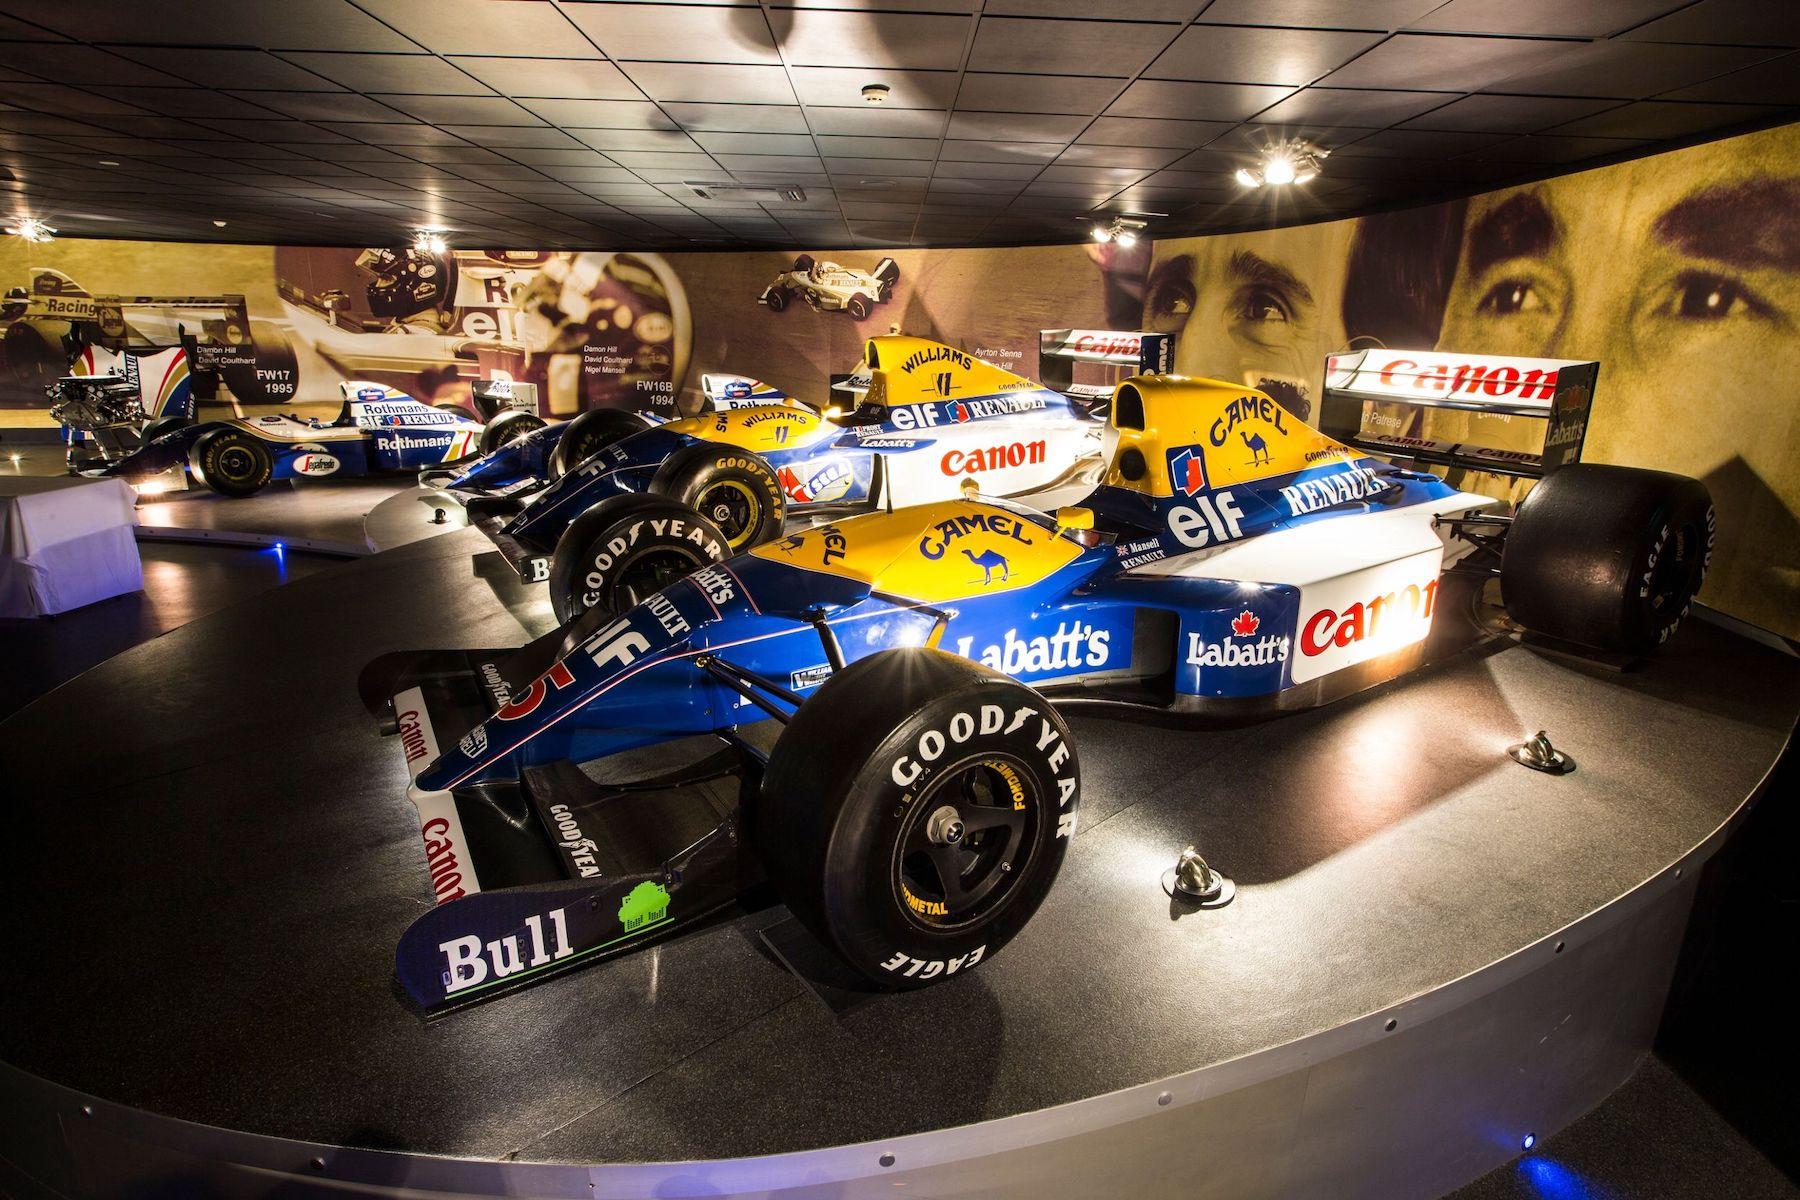 2017 Williams celebration at Silverstone 1 copy.jpg